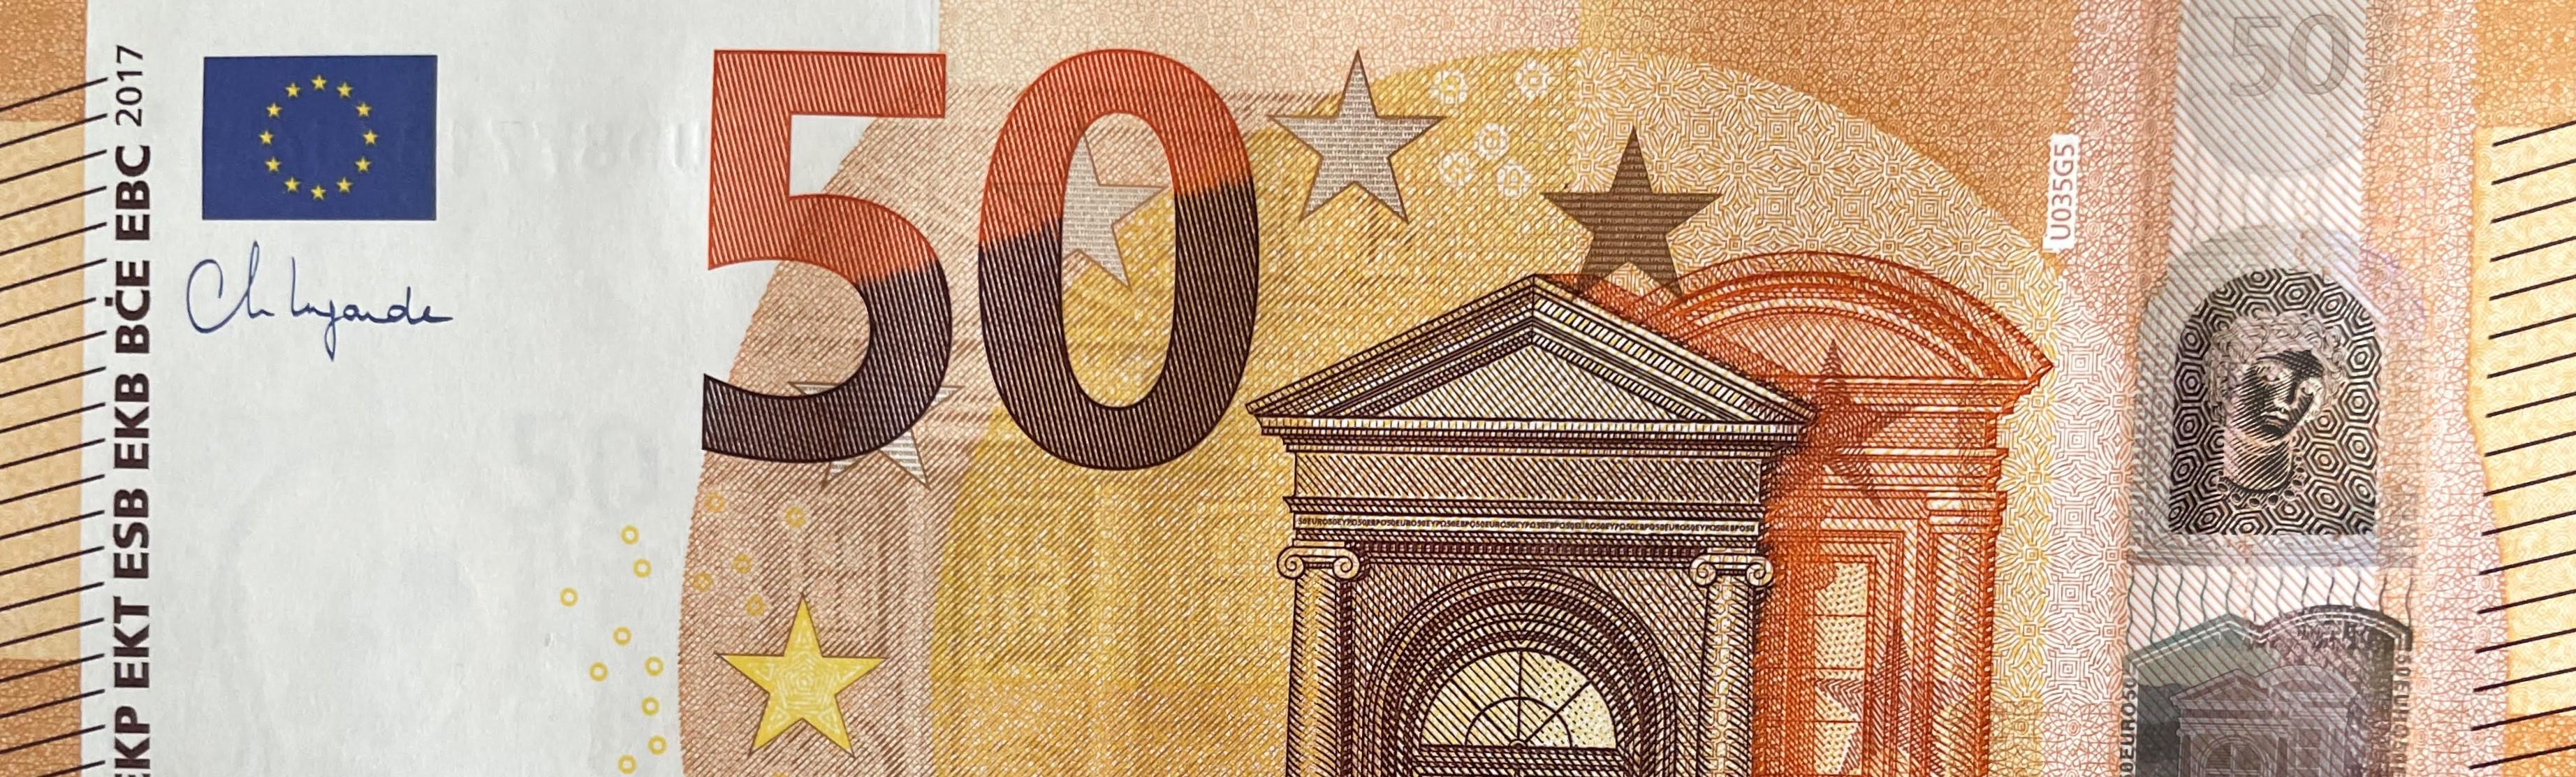 50_u_u_035_lagarde_-_collection_europe_201.jpg